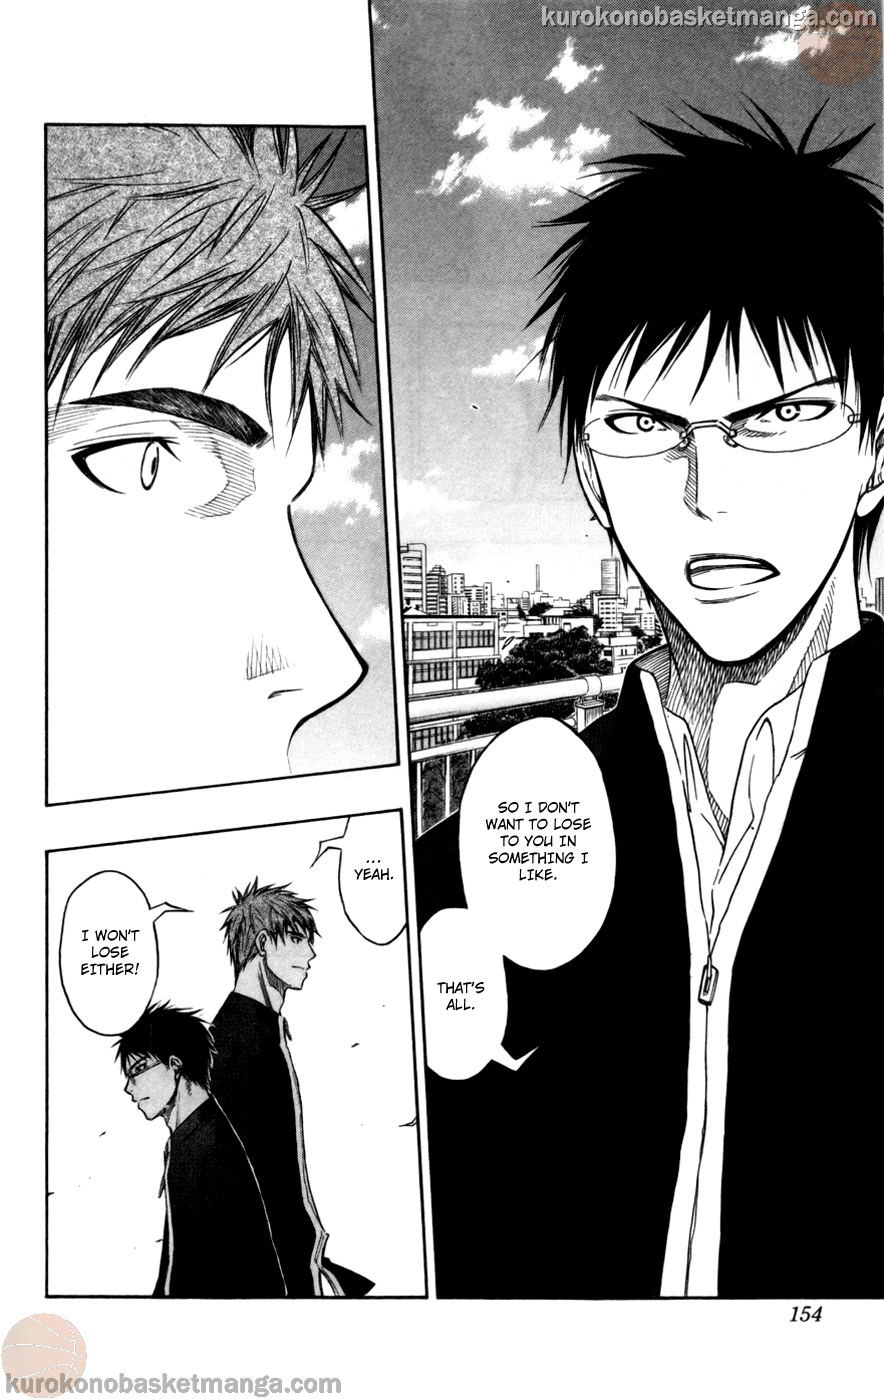 Kuroko no Basket Manga Chapter 97 - Image 08